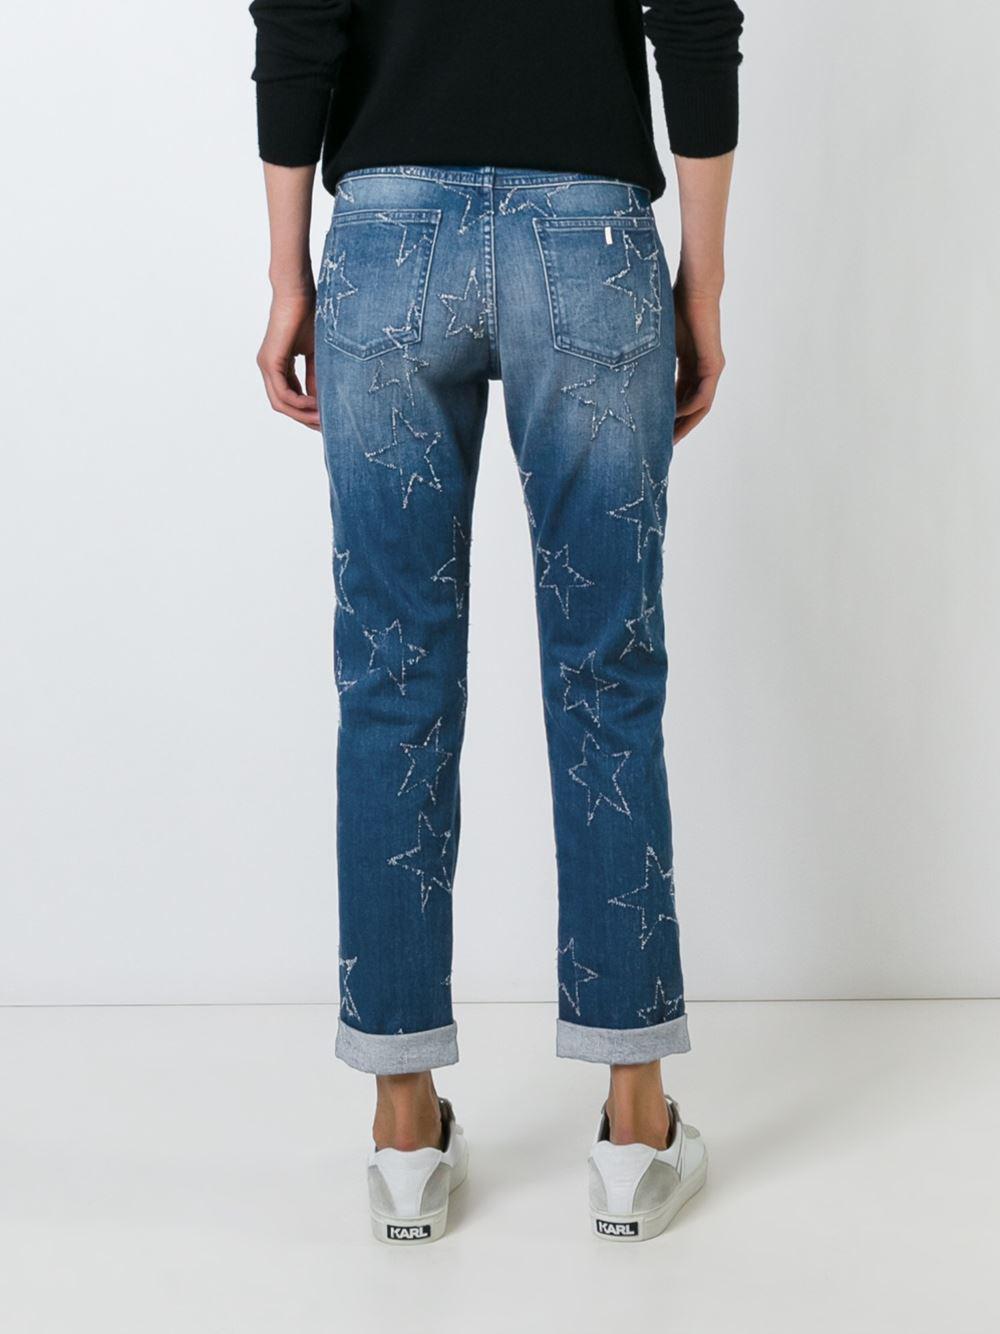 Stella McCartney Denim Star Accent Straight-fit Jeans in Blue